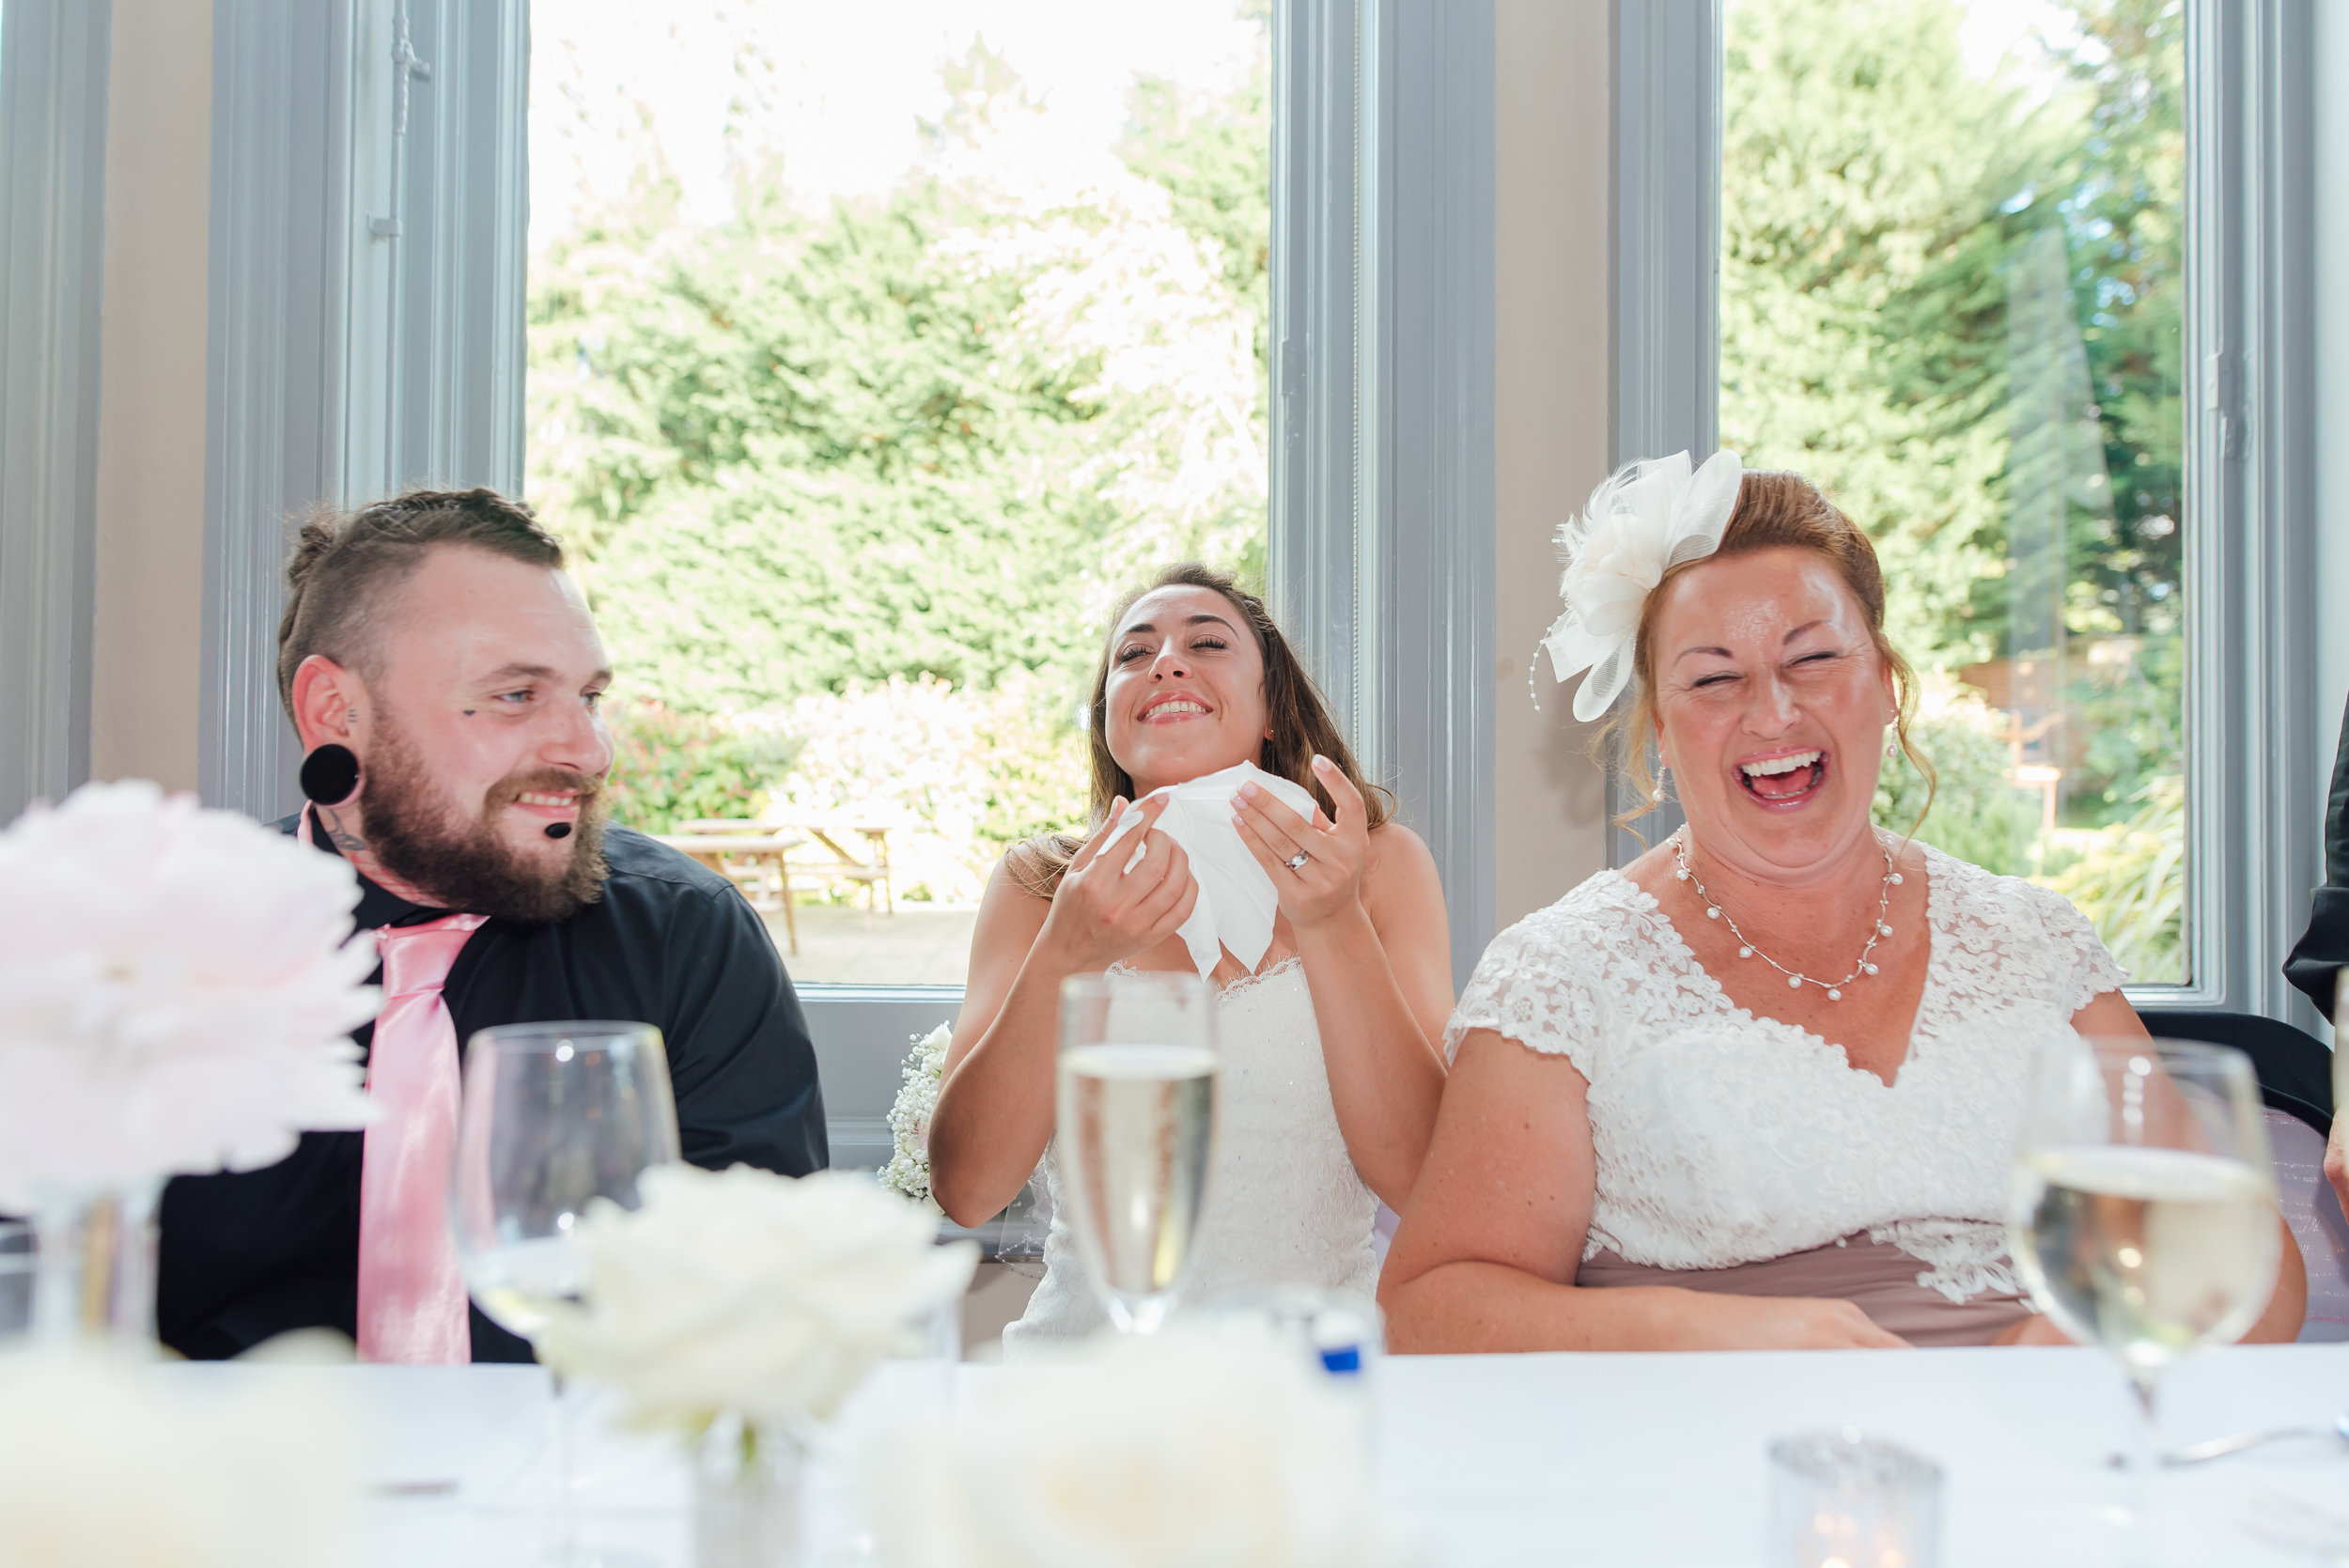 Hampshire-wedding-photographer : Amy-james-photography : Surrey-wedding-photographer : Fleet-wedding-photographer : Worplesdon-Place-Wedding : Worplesdon-place-wedding-photographer : documentary-wedding-photographer-hampshire-surrey-berkshire-943.jpg